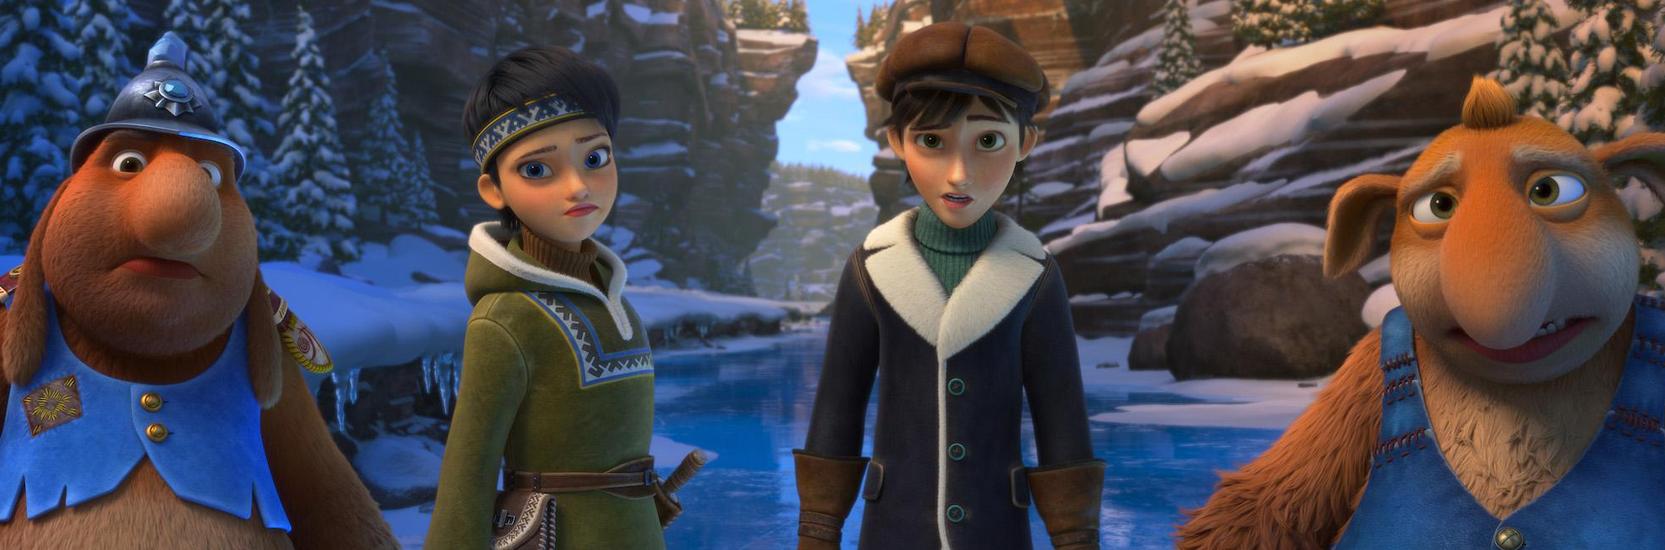 Quoi de neuf chez Wizart Animation ?